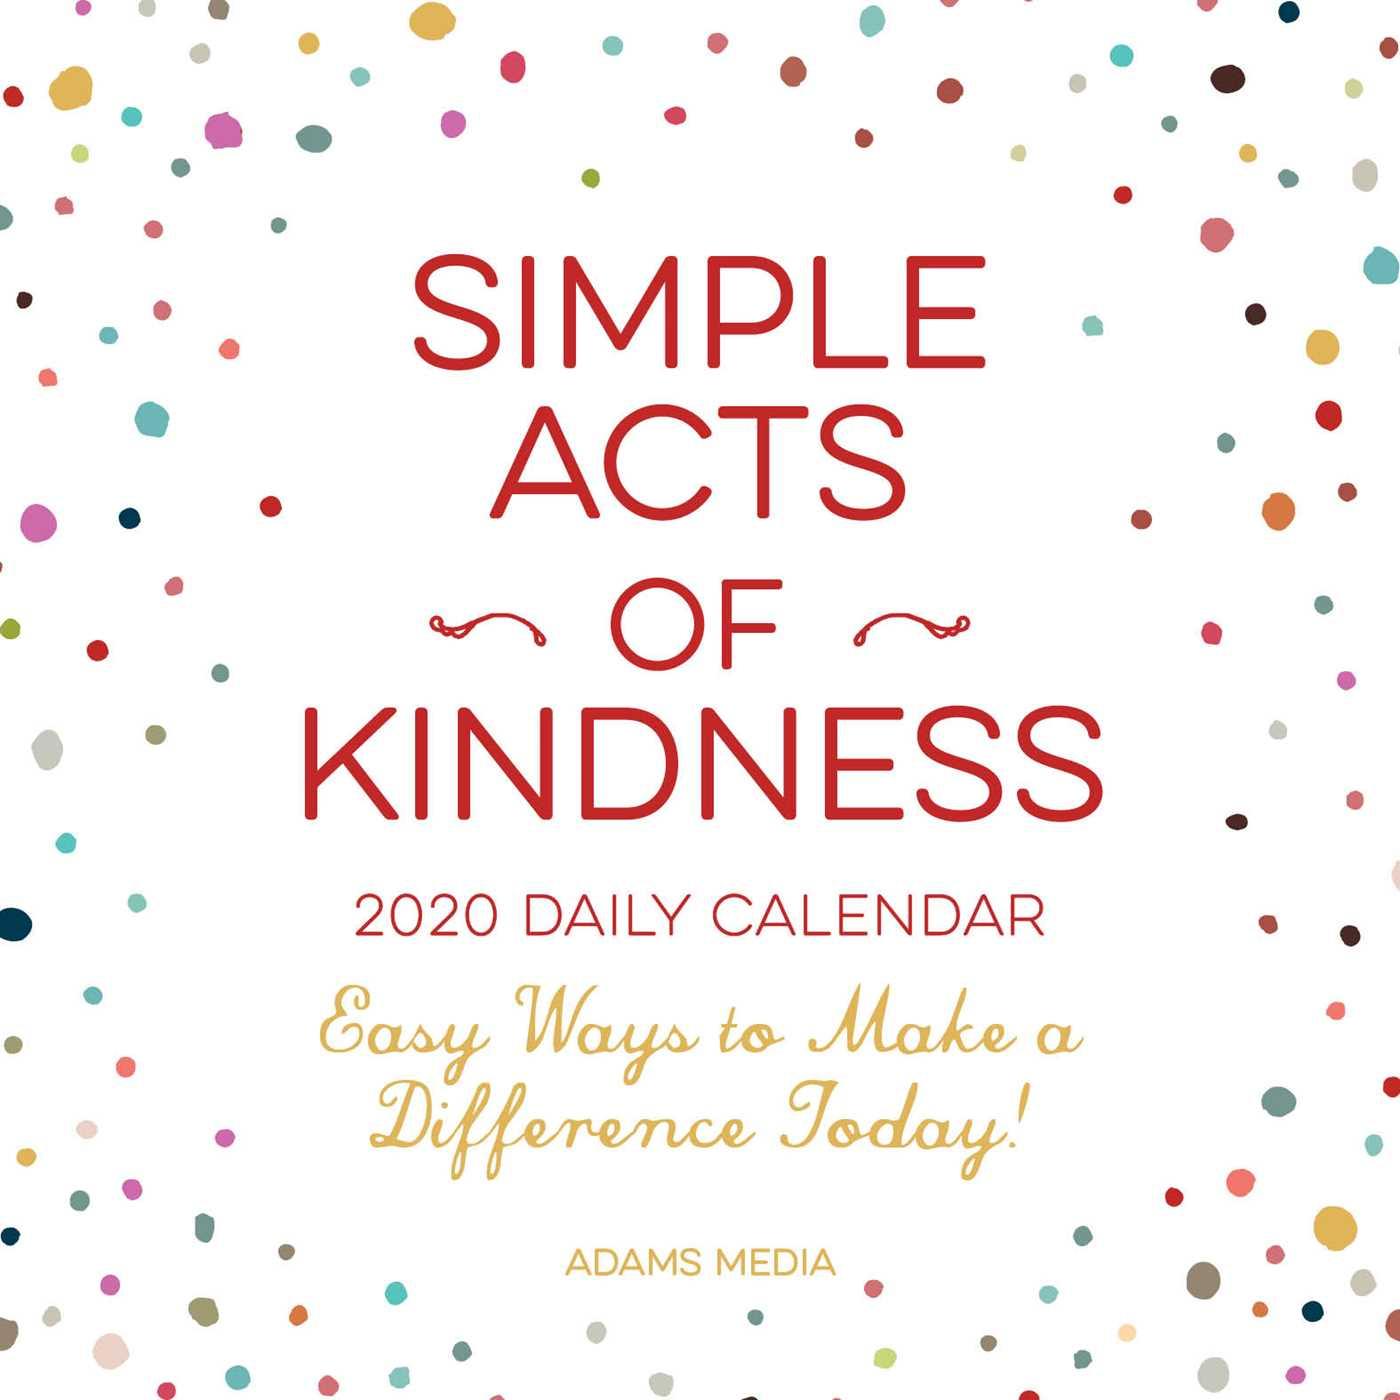 2020 Daily Calendar